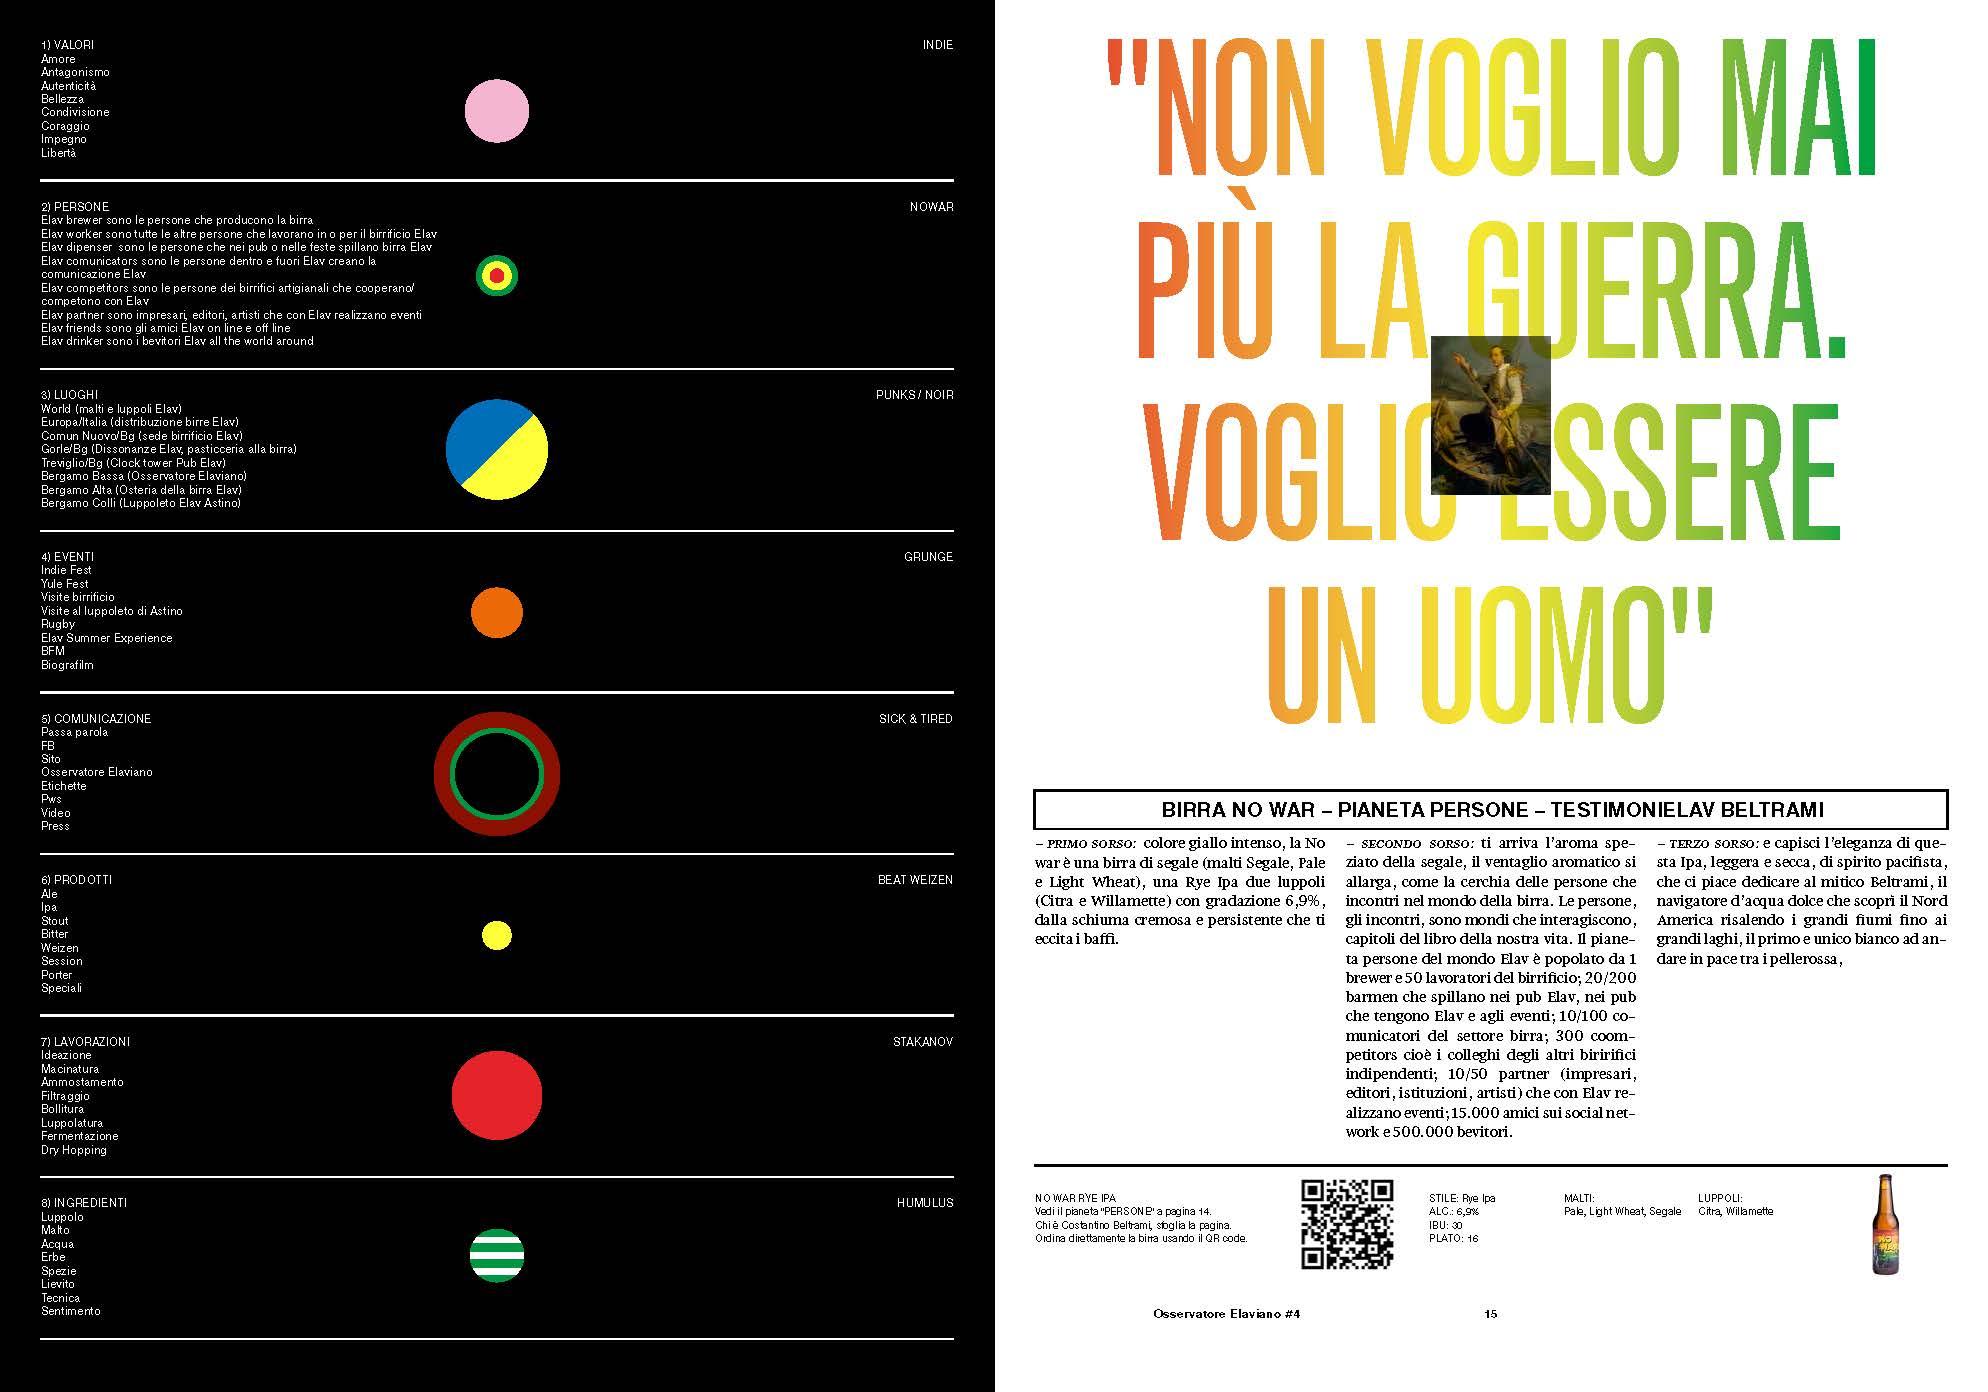 ELAV_4_PREV_TOT_3_Luglio_B_Pagina_08